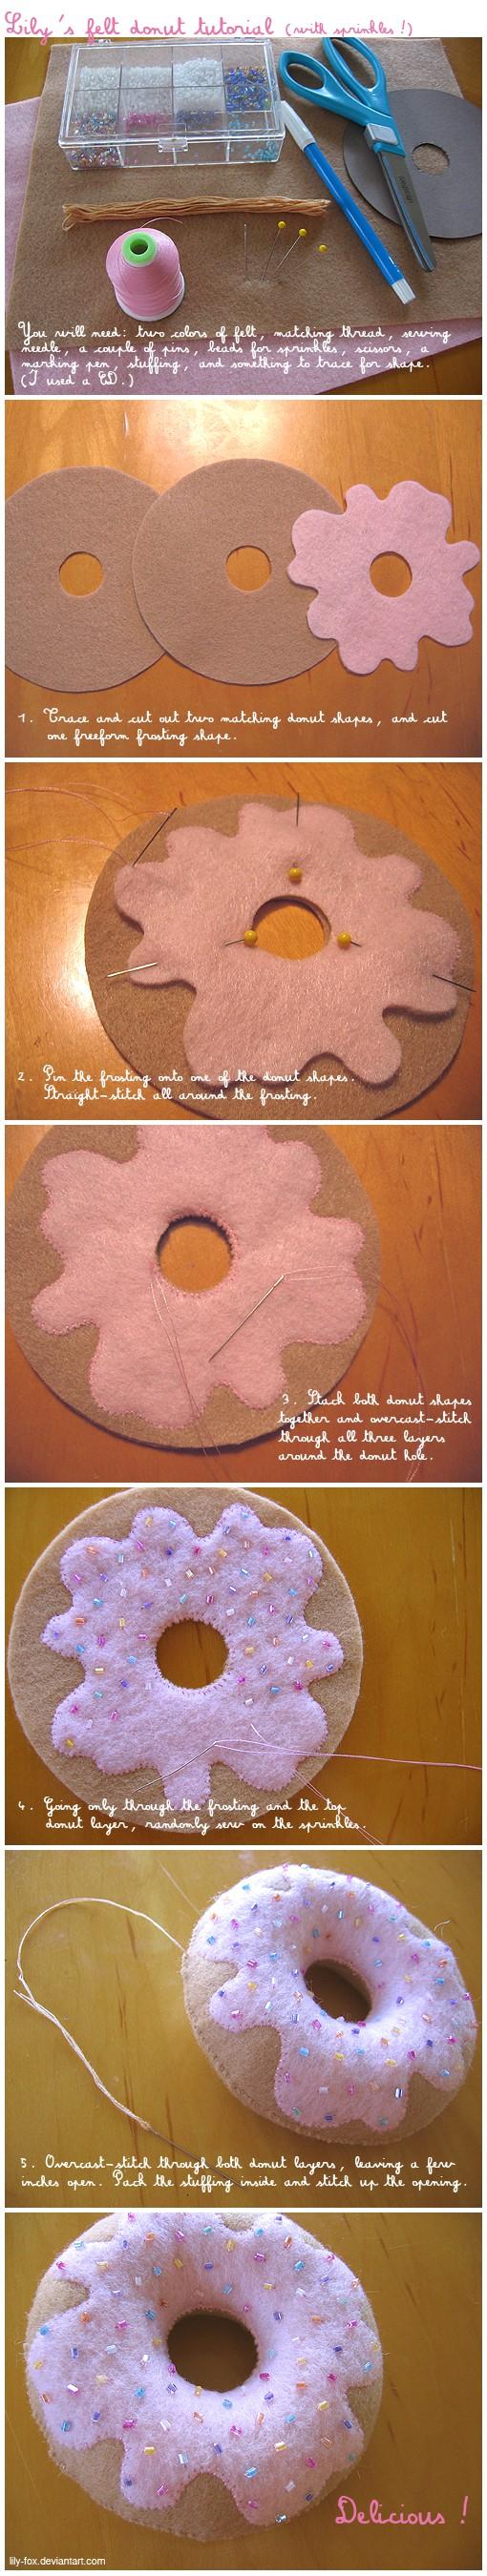 Cute hand sewn felt donut